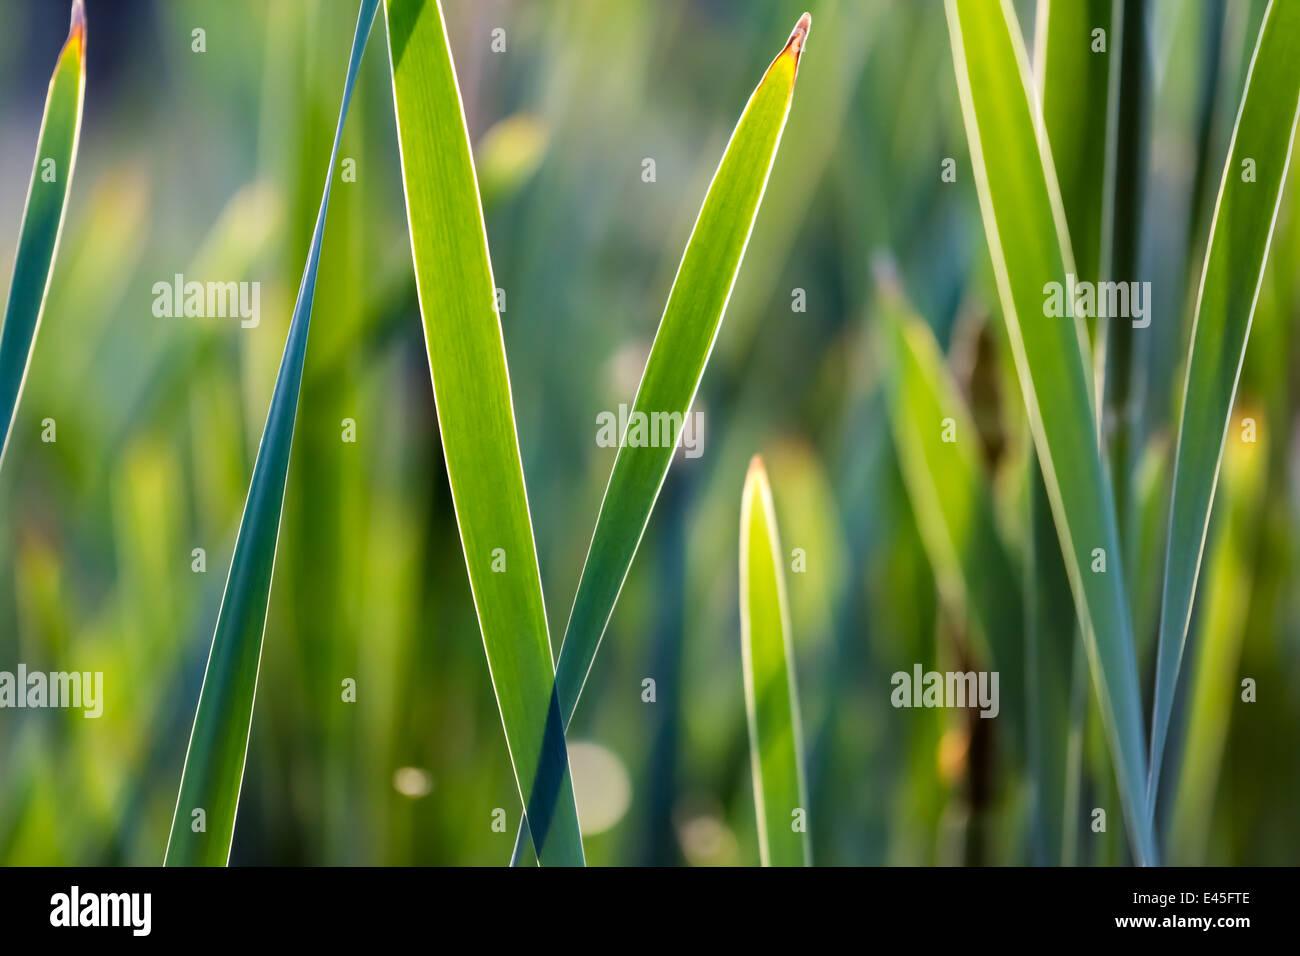 plante aquatique faible profondeur